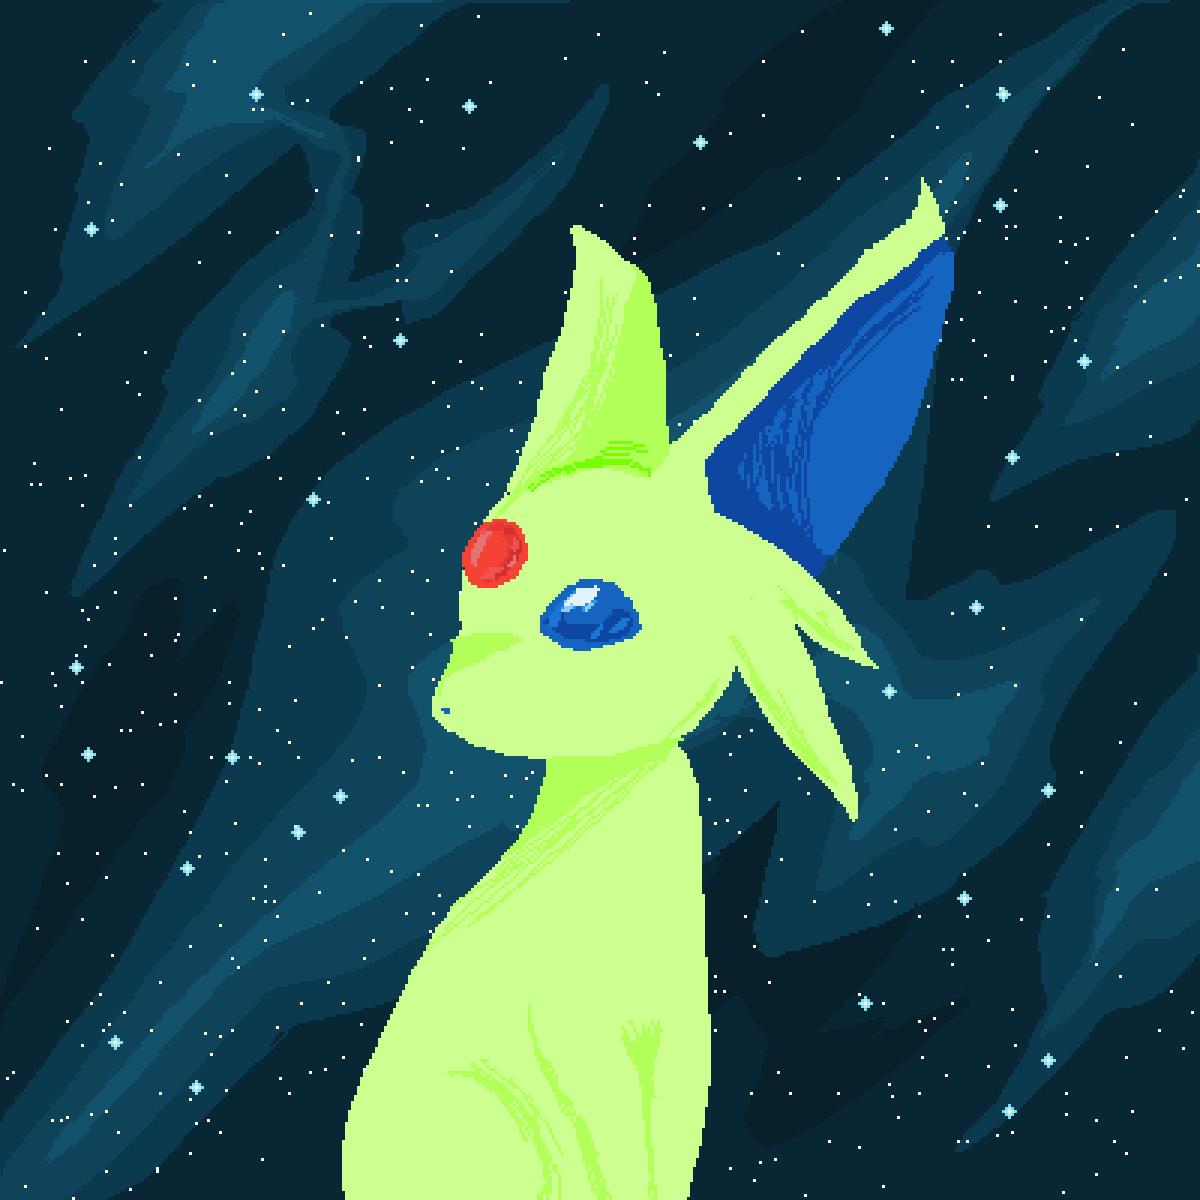 Seer of the Night Stars